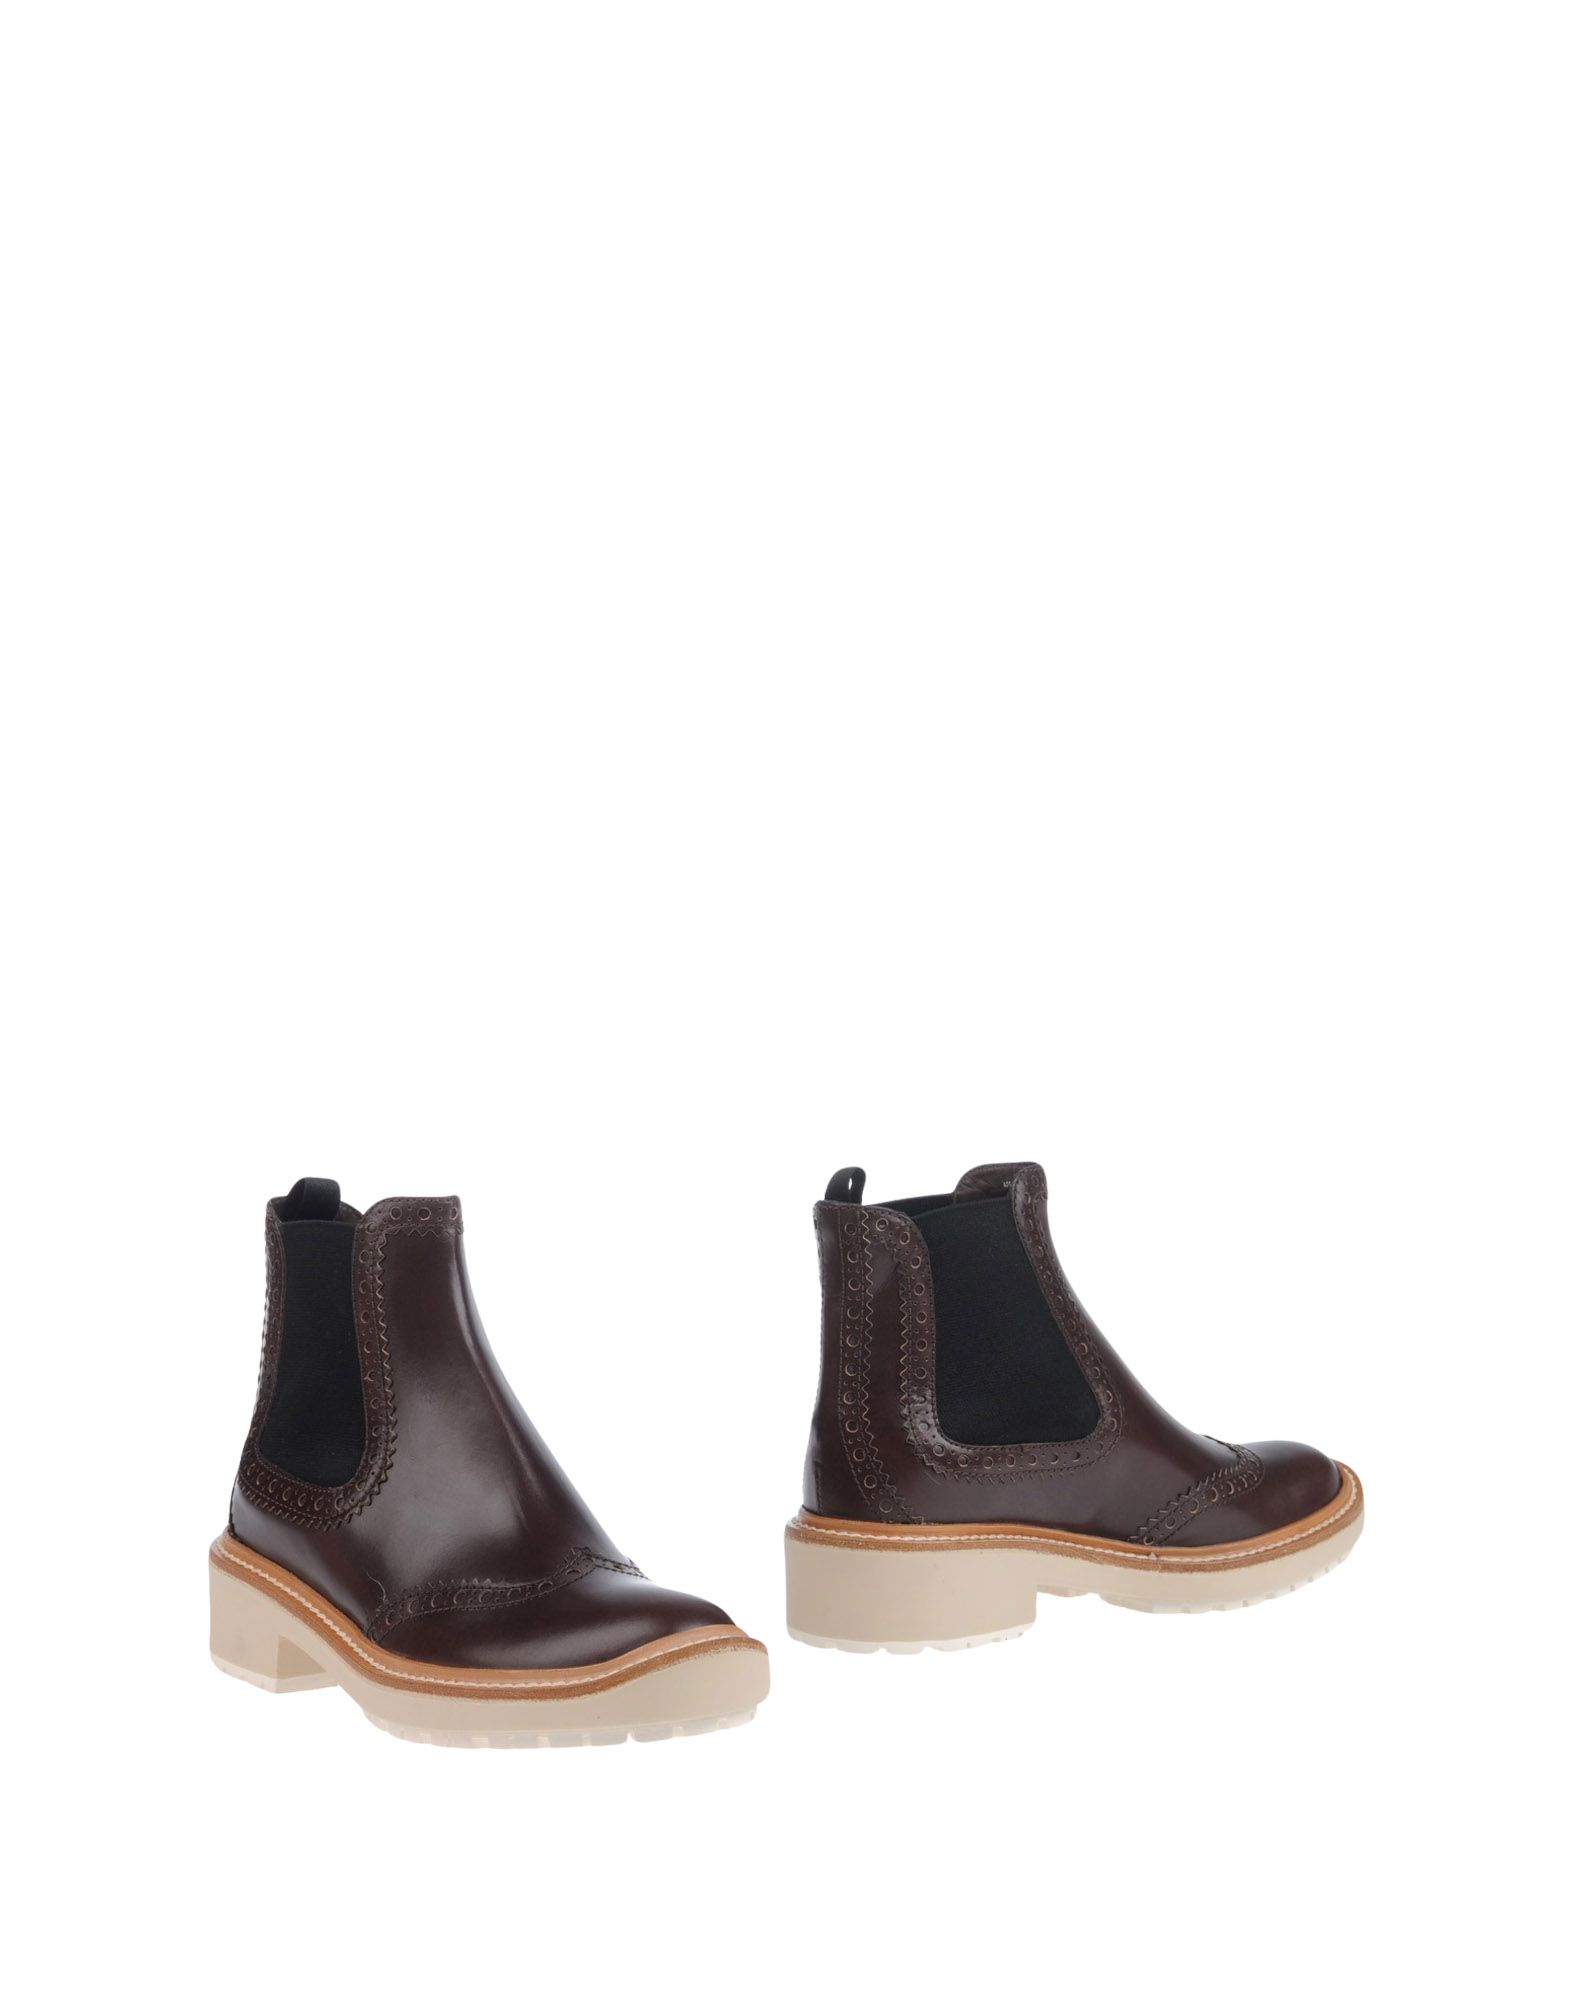 Miu Miu Boots Chelsea Boots Miu Damen  11244045WV Neue Schuhe b2bcf6